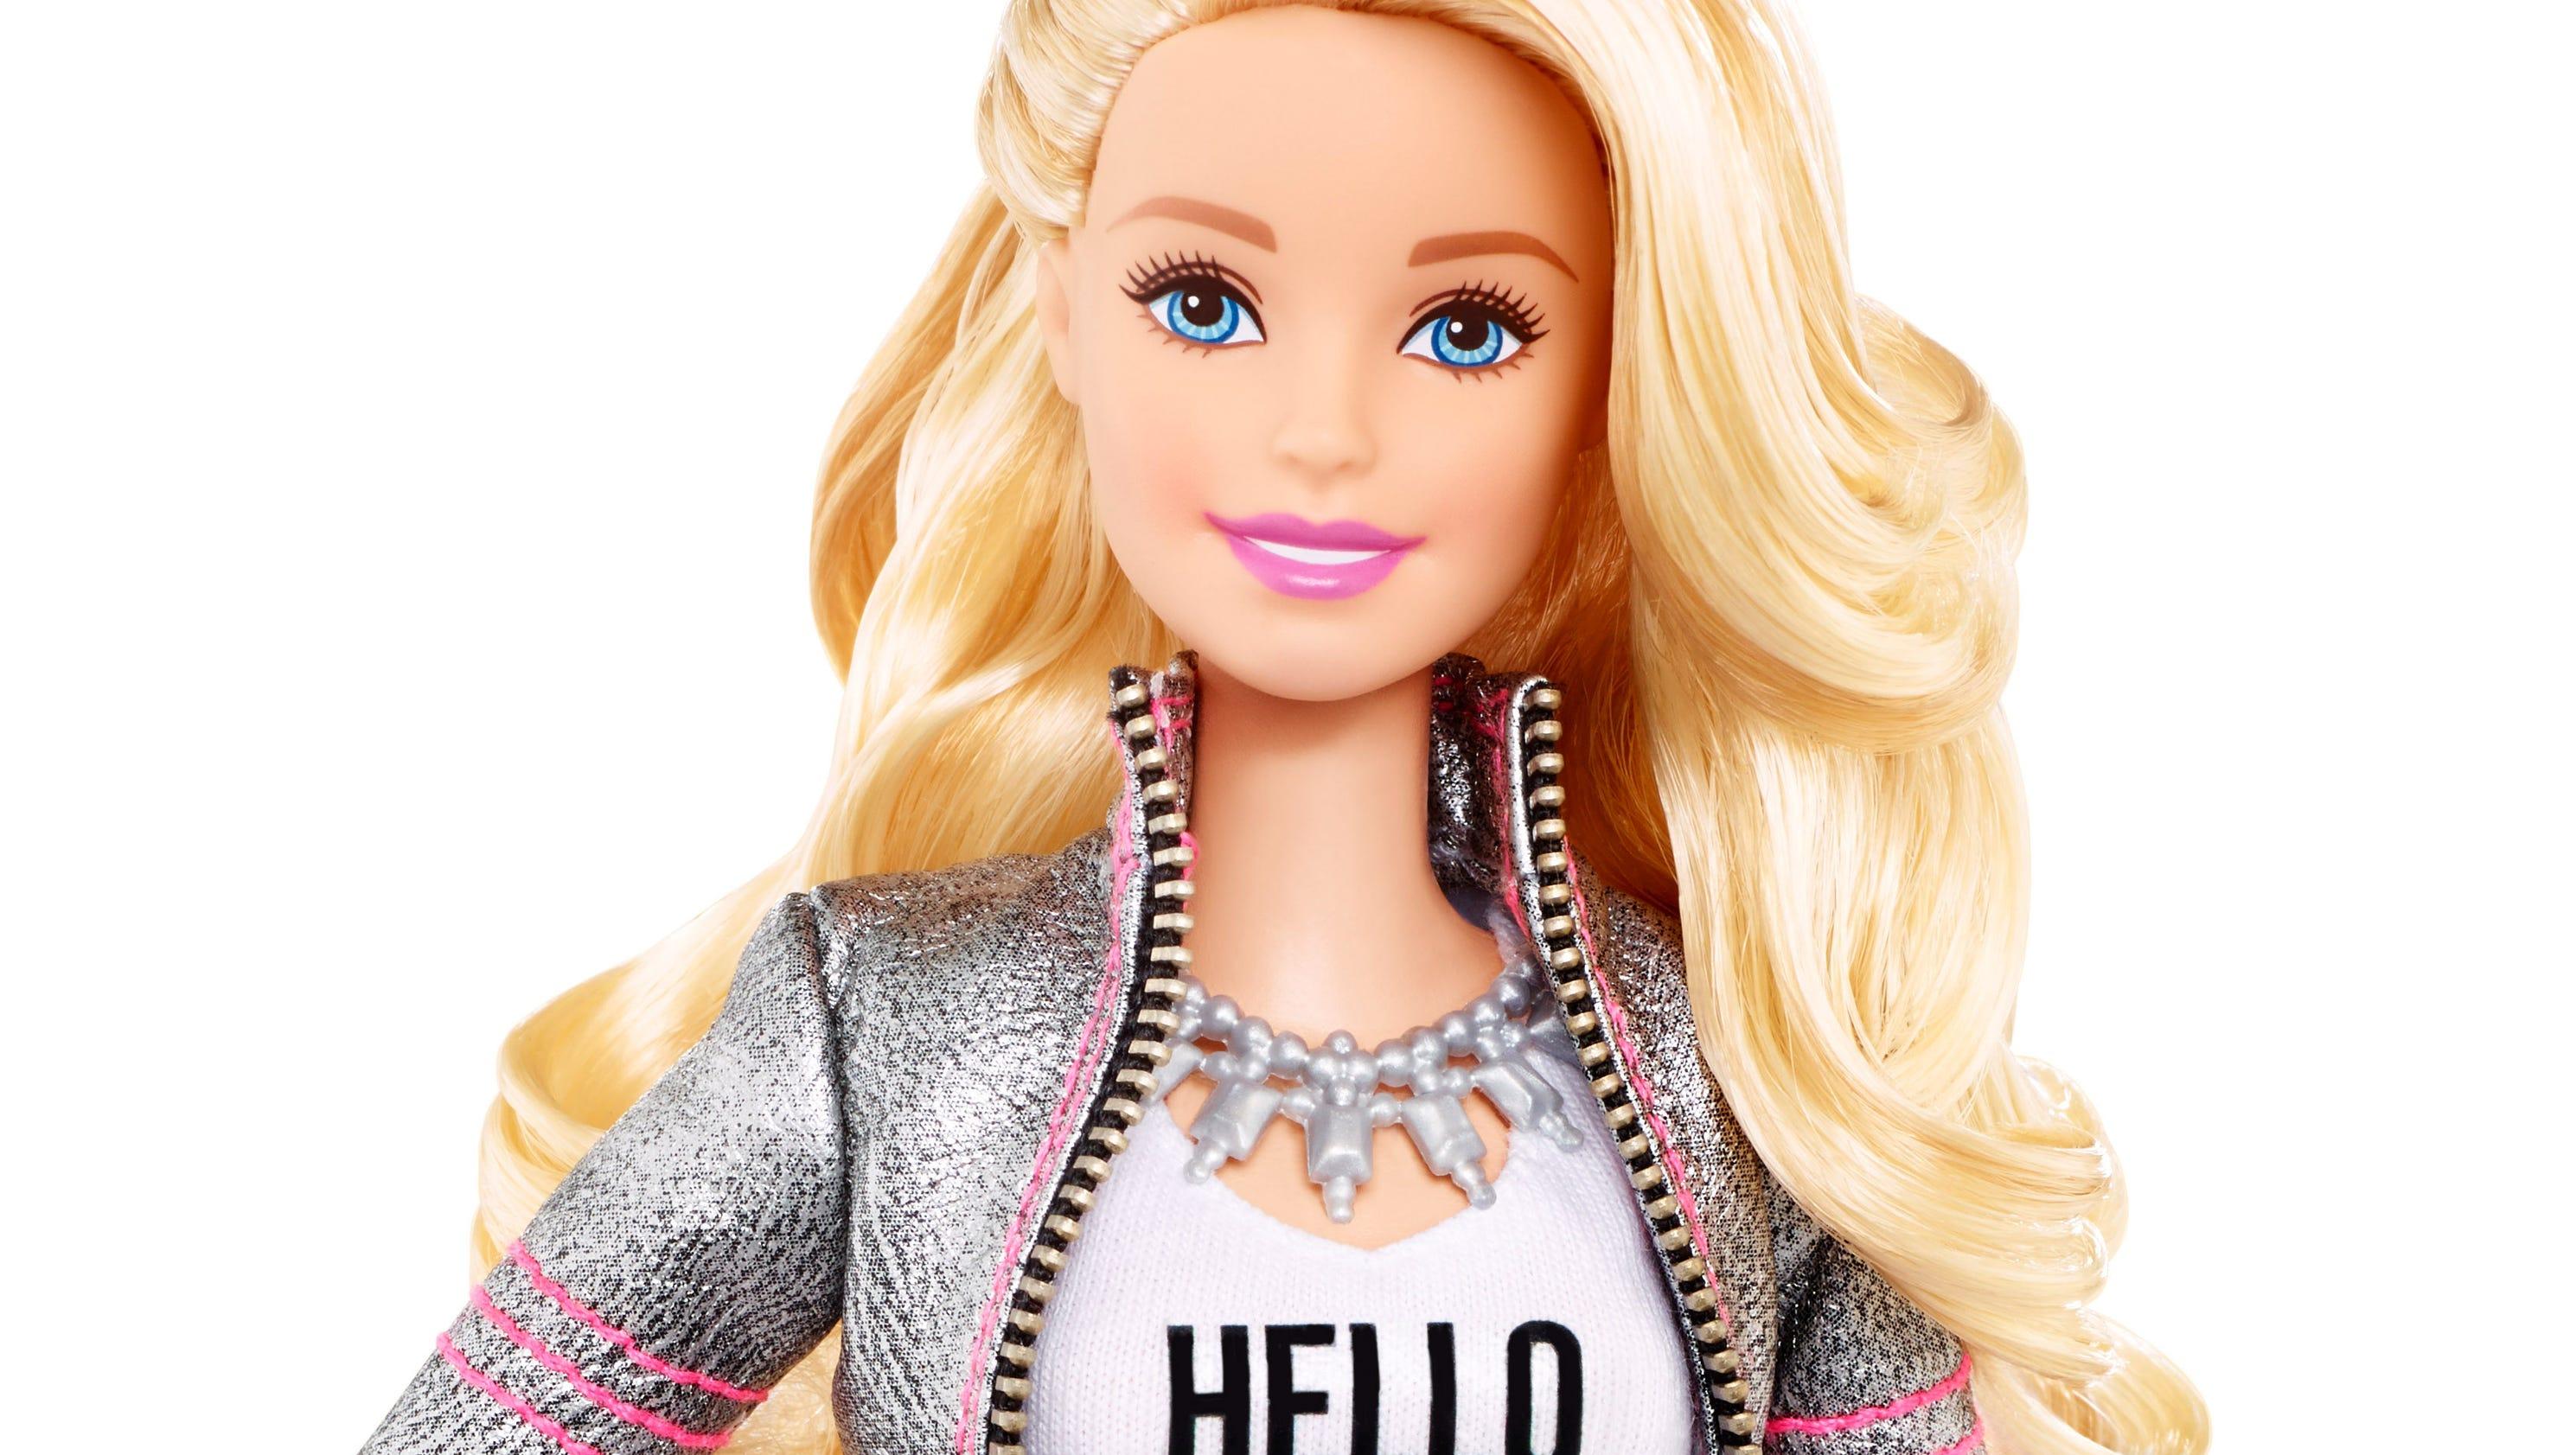 High-tech 'talking' Barbie Bad Idea, Group Says